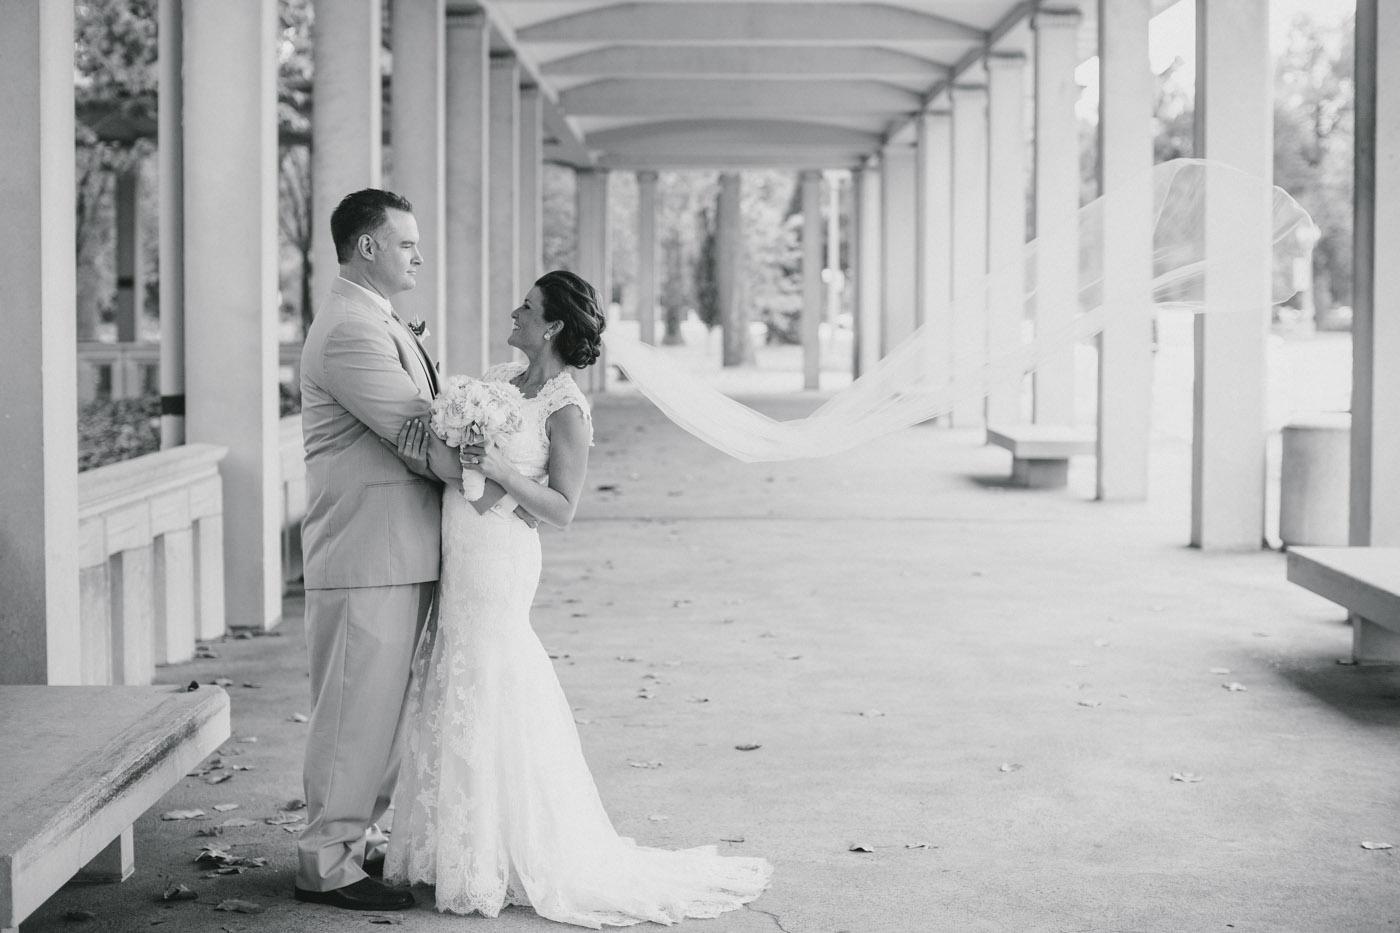 St-Louis-Wedding-Photography-1041.jpg